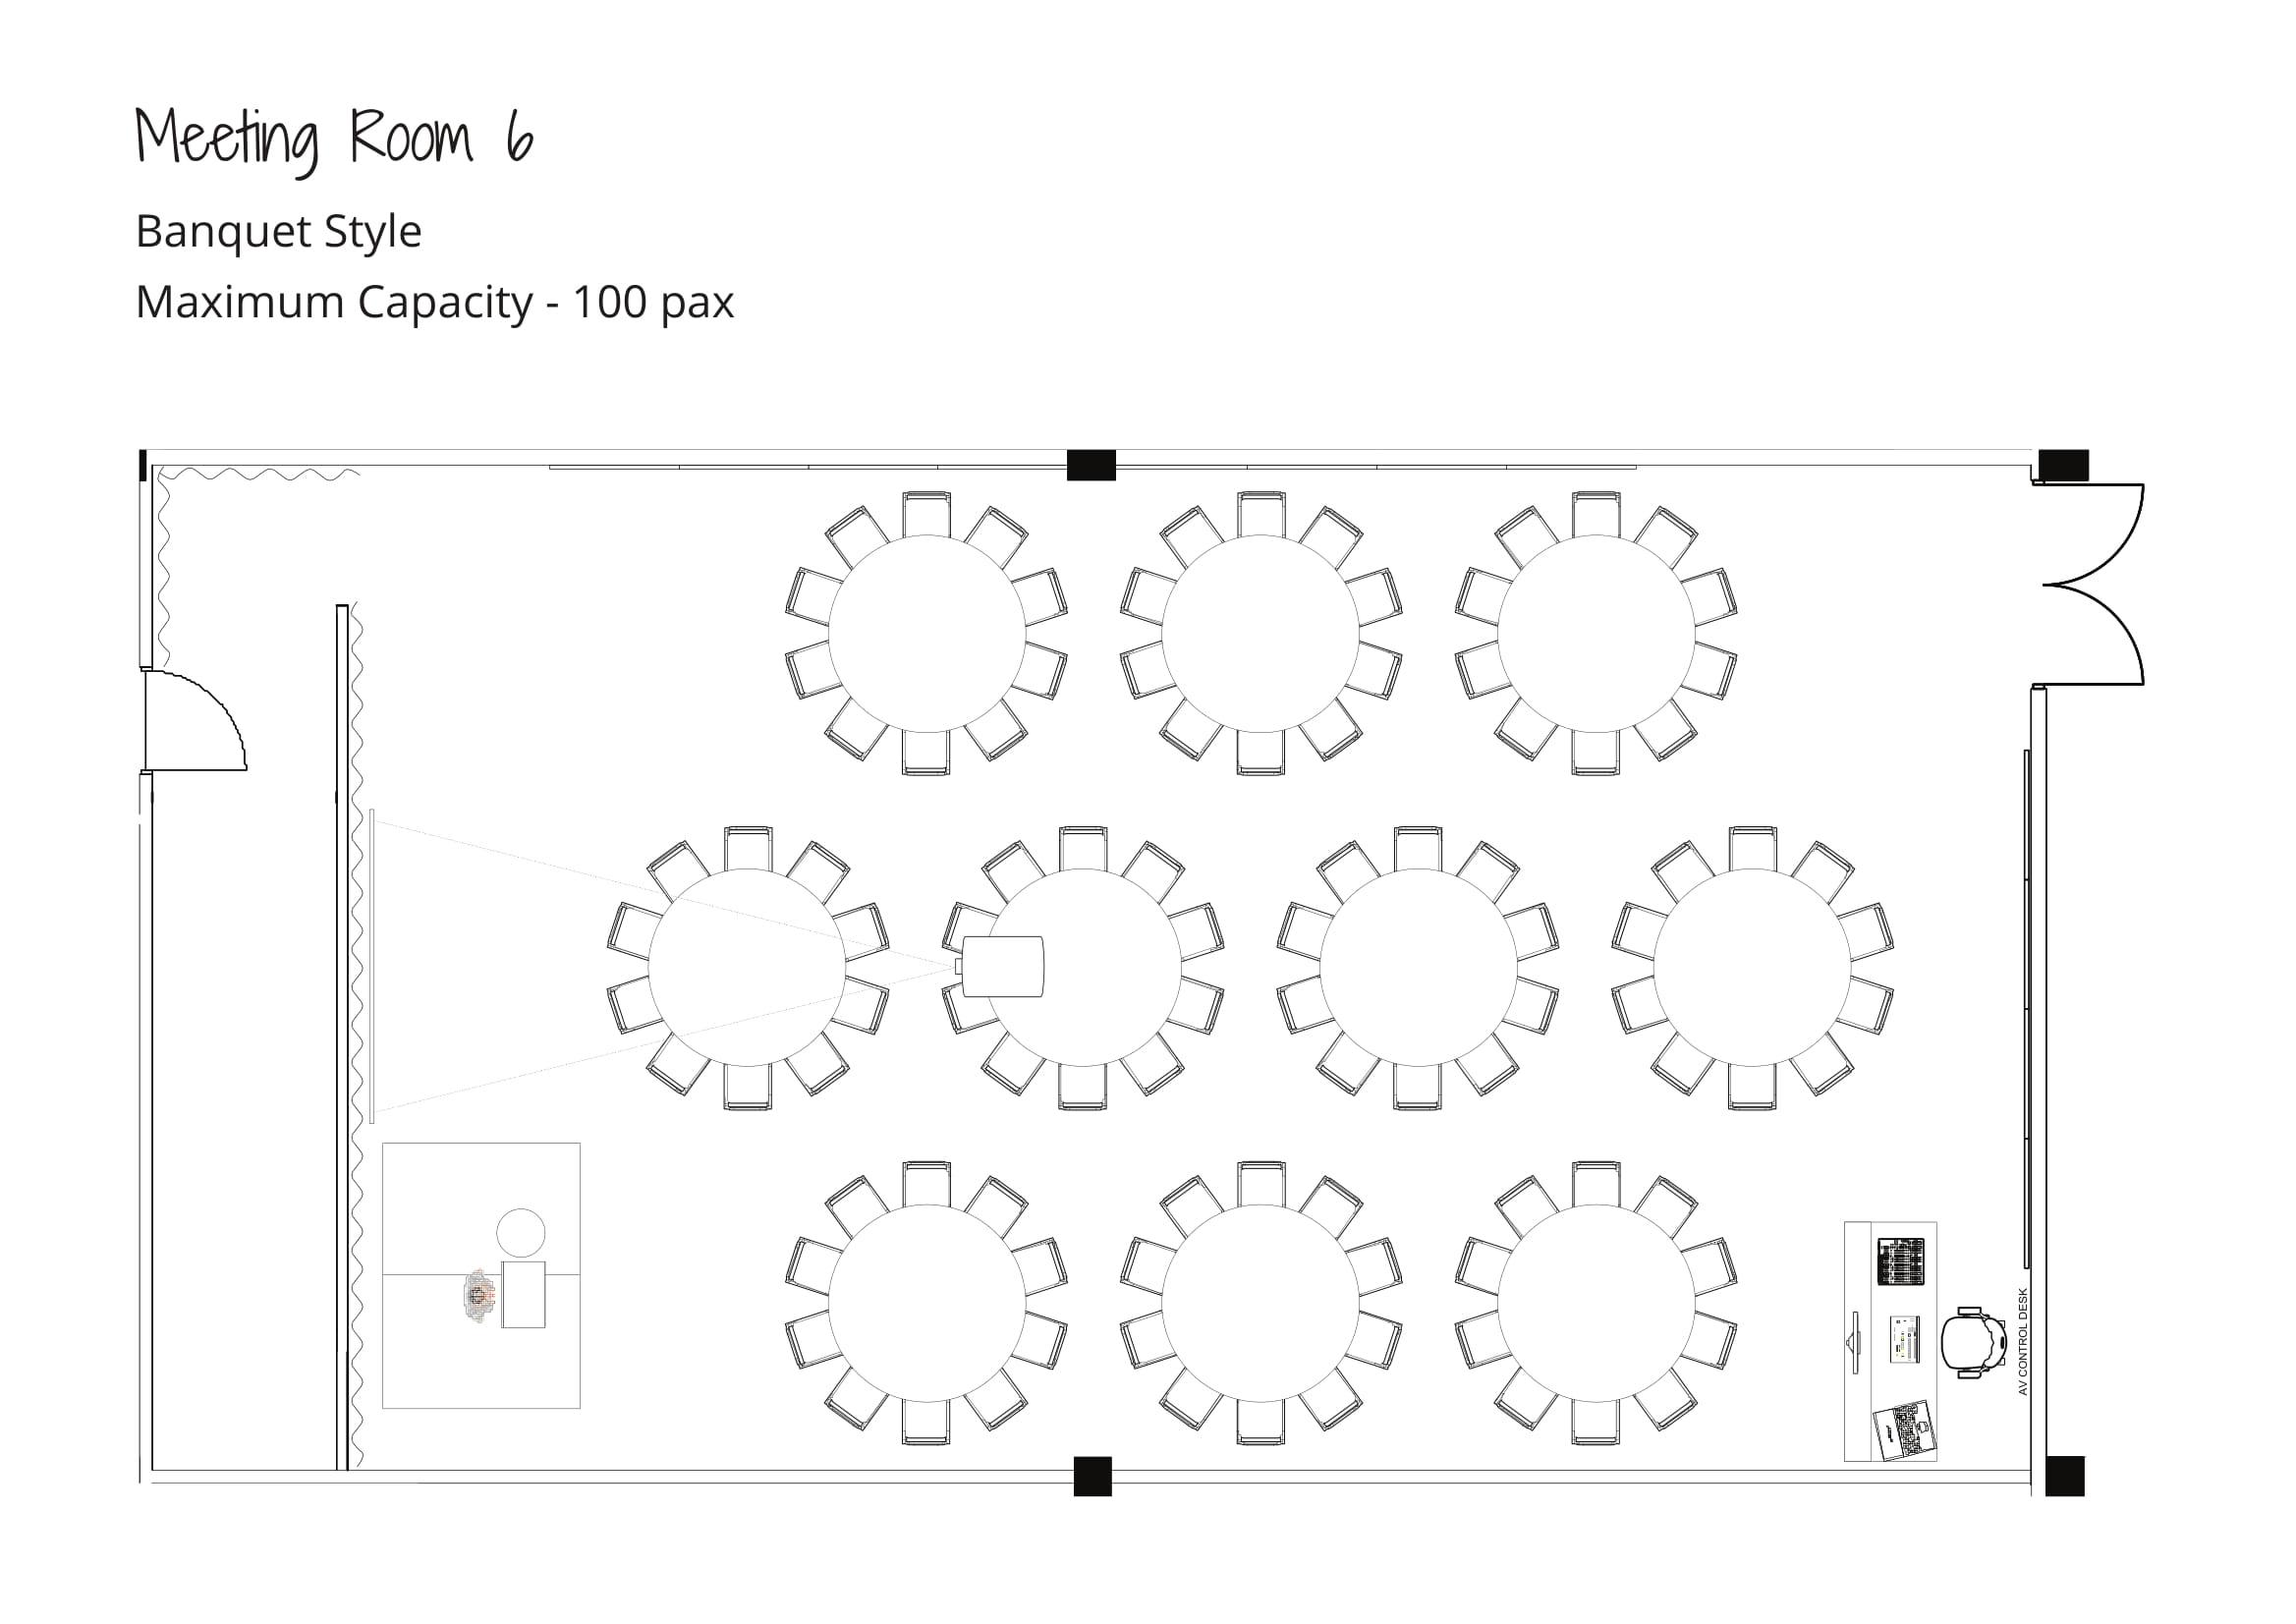 Level 2 - Maximum Capacity - Banquet Style - Meeting Room 6-1